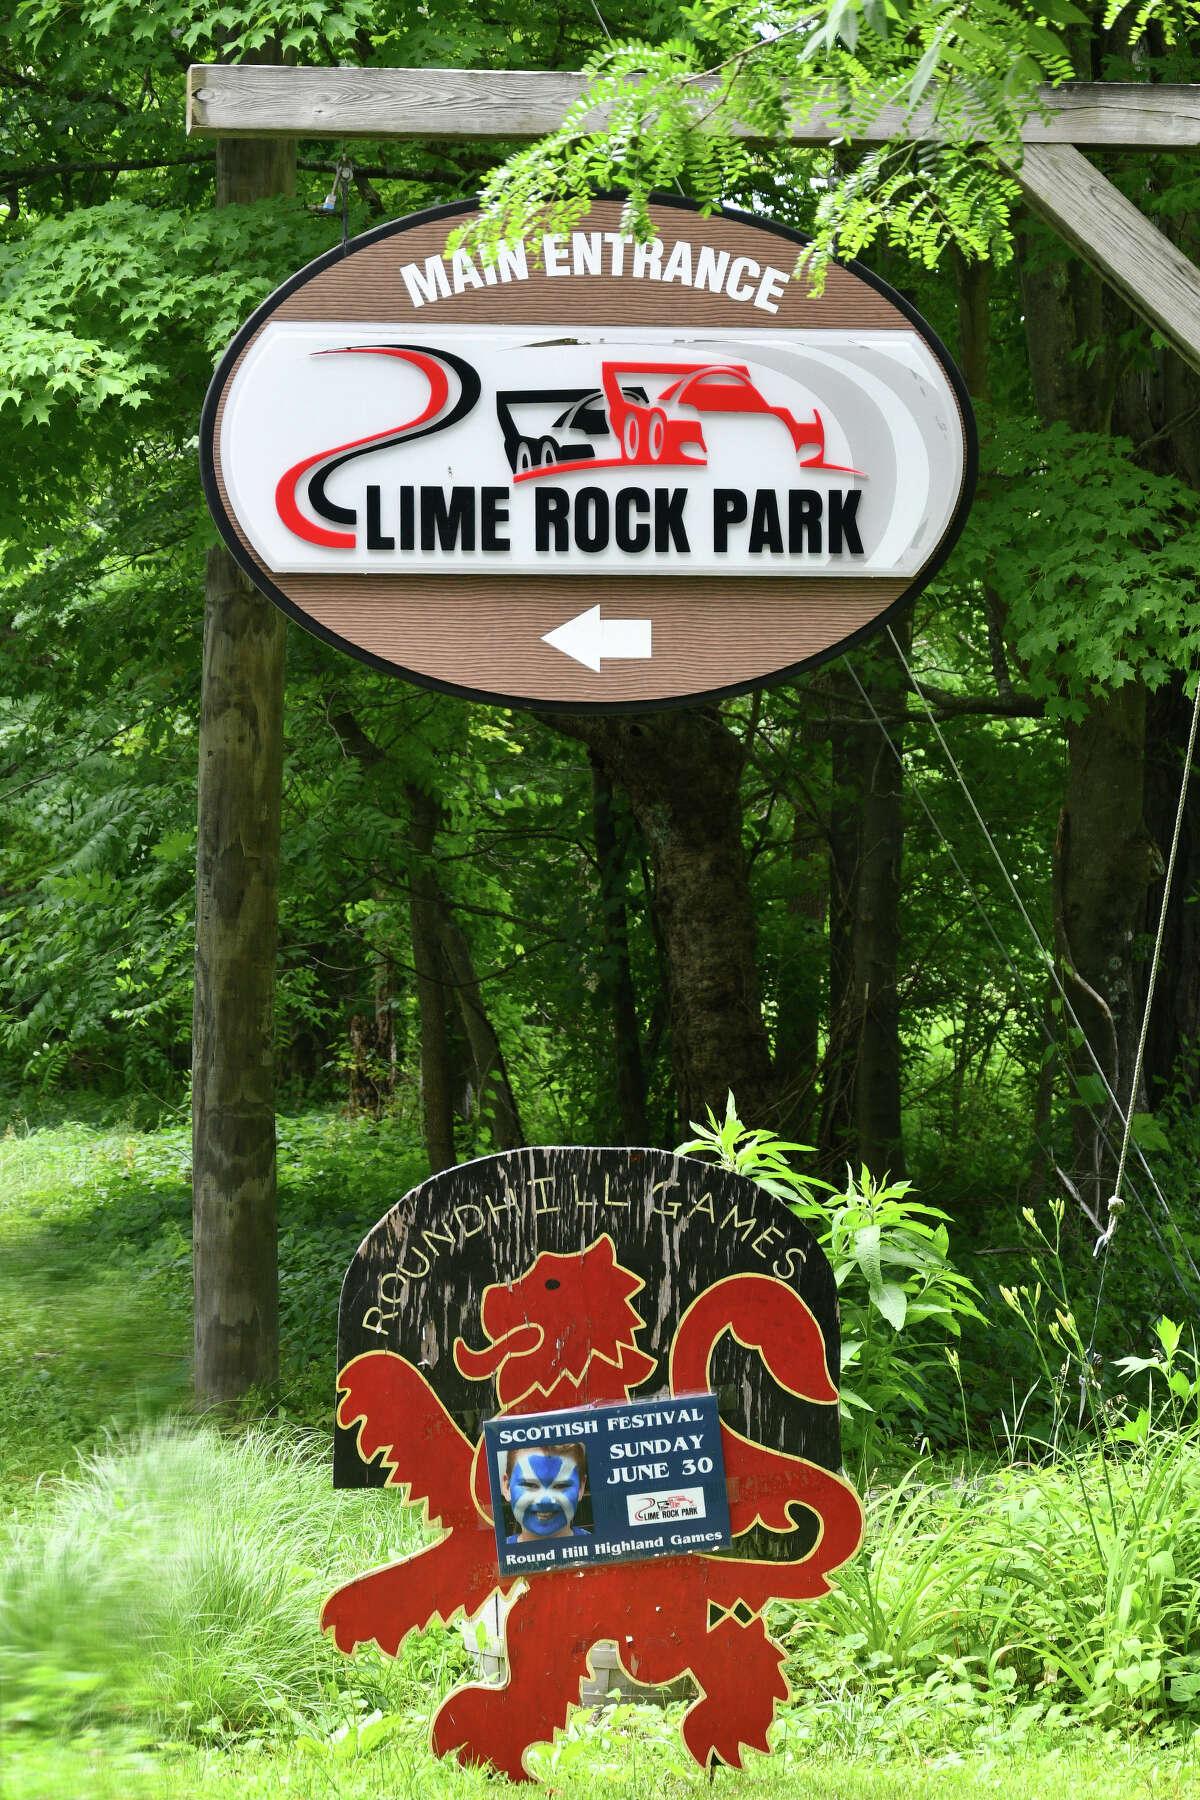 Entrance to Lime Rock Park in Lakeville, Connecticut.